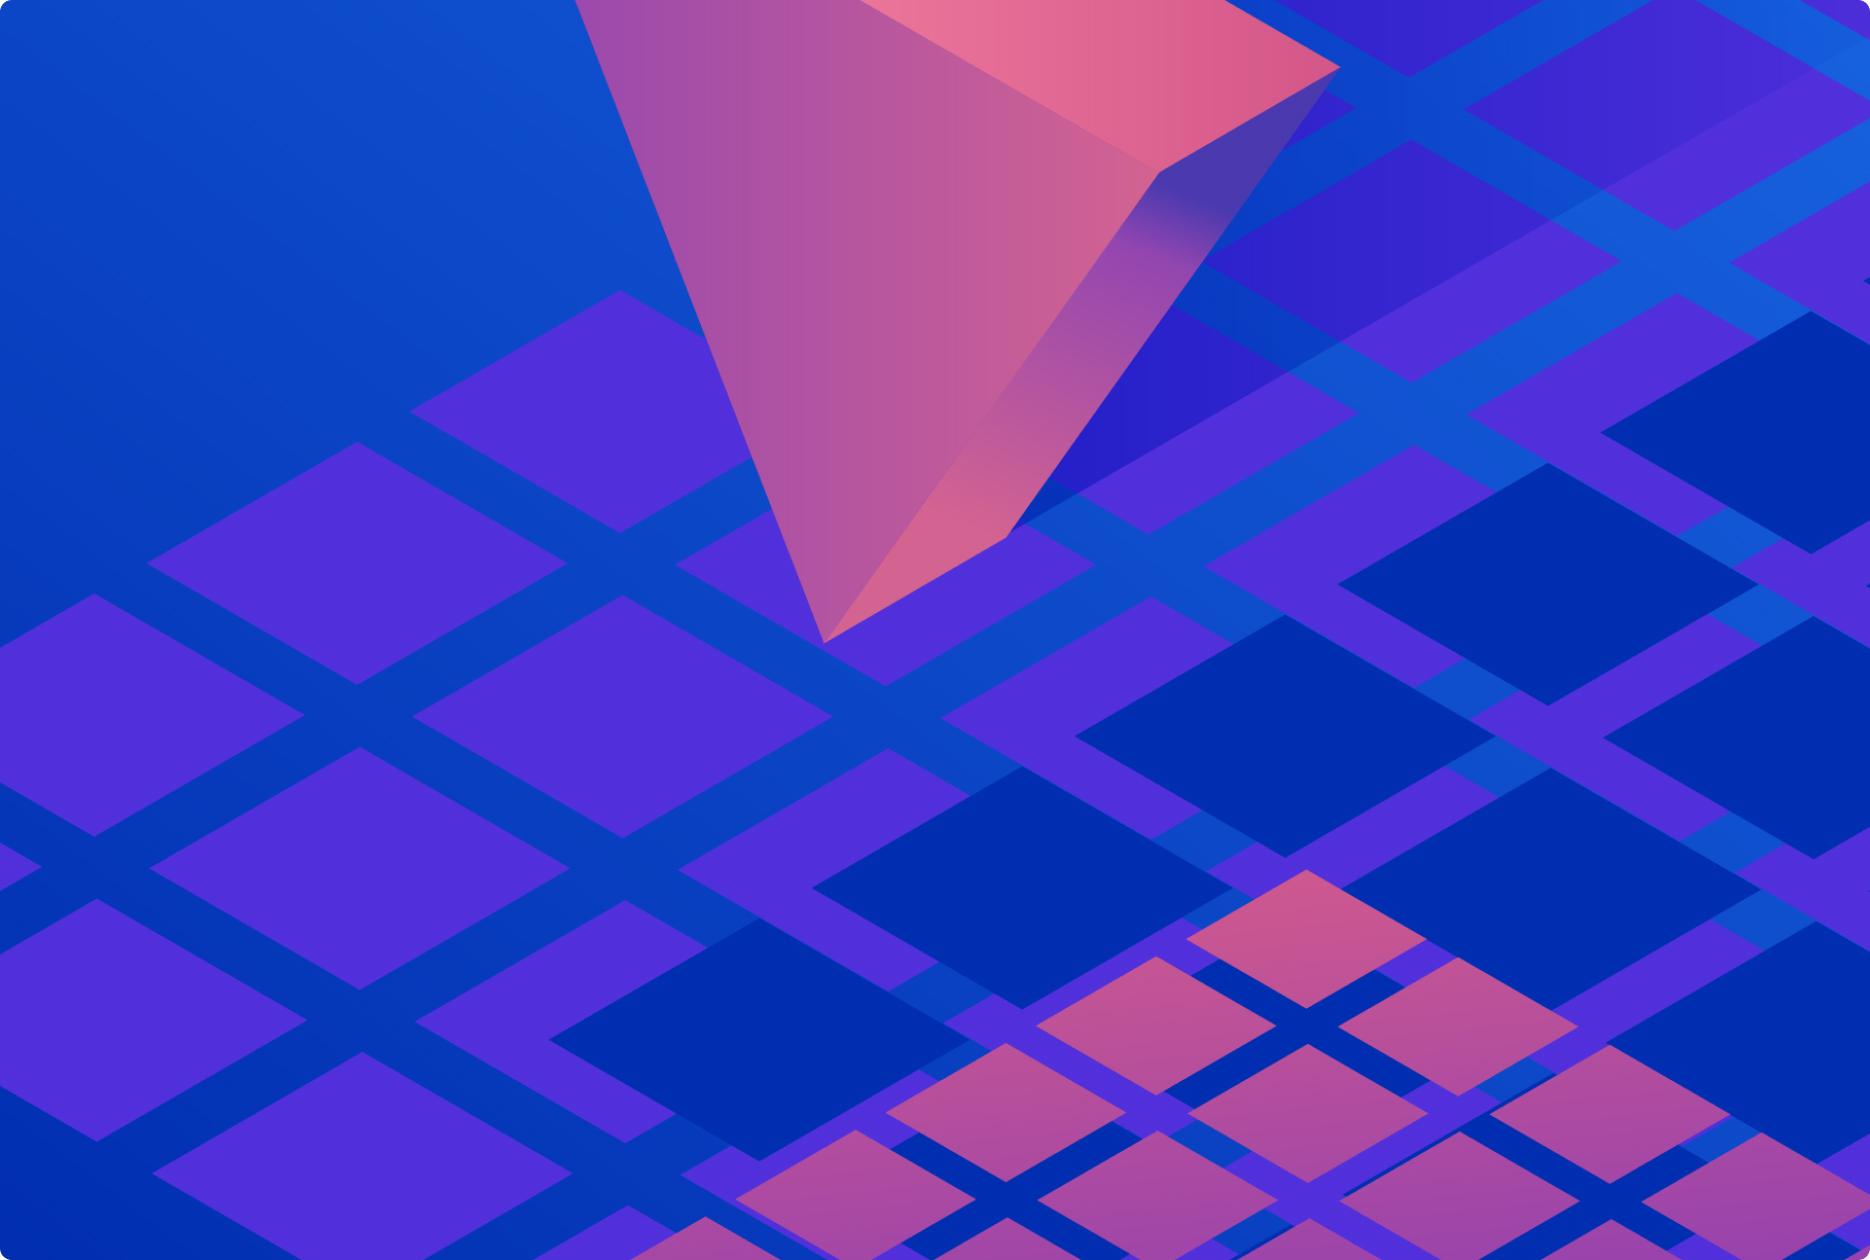 grid_new_1